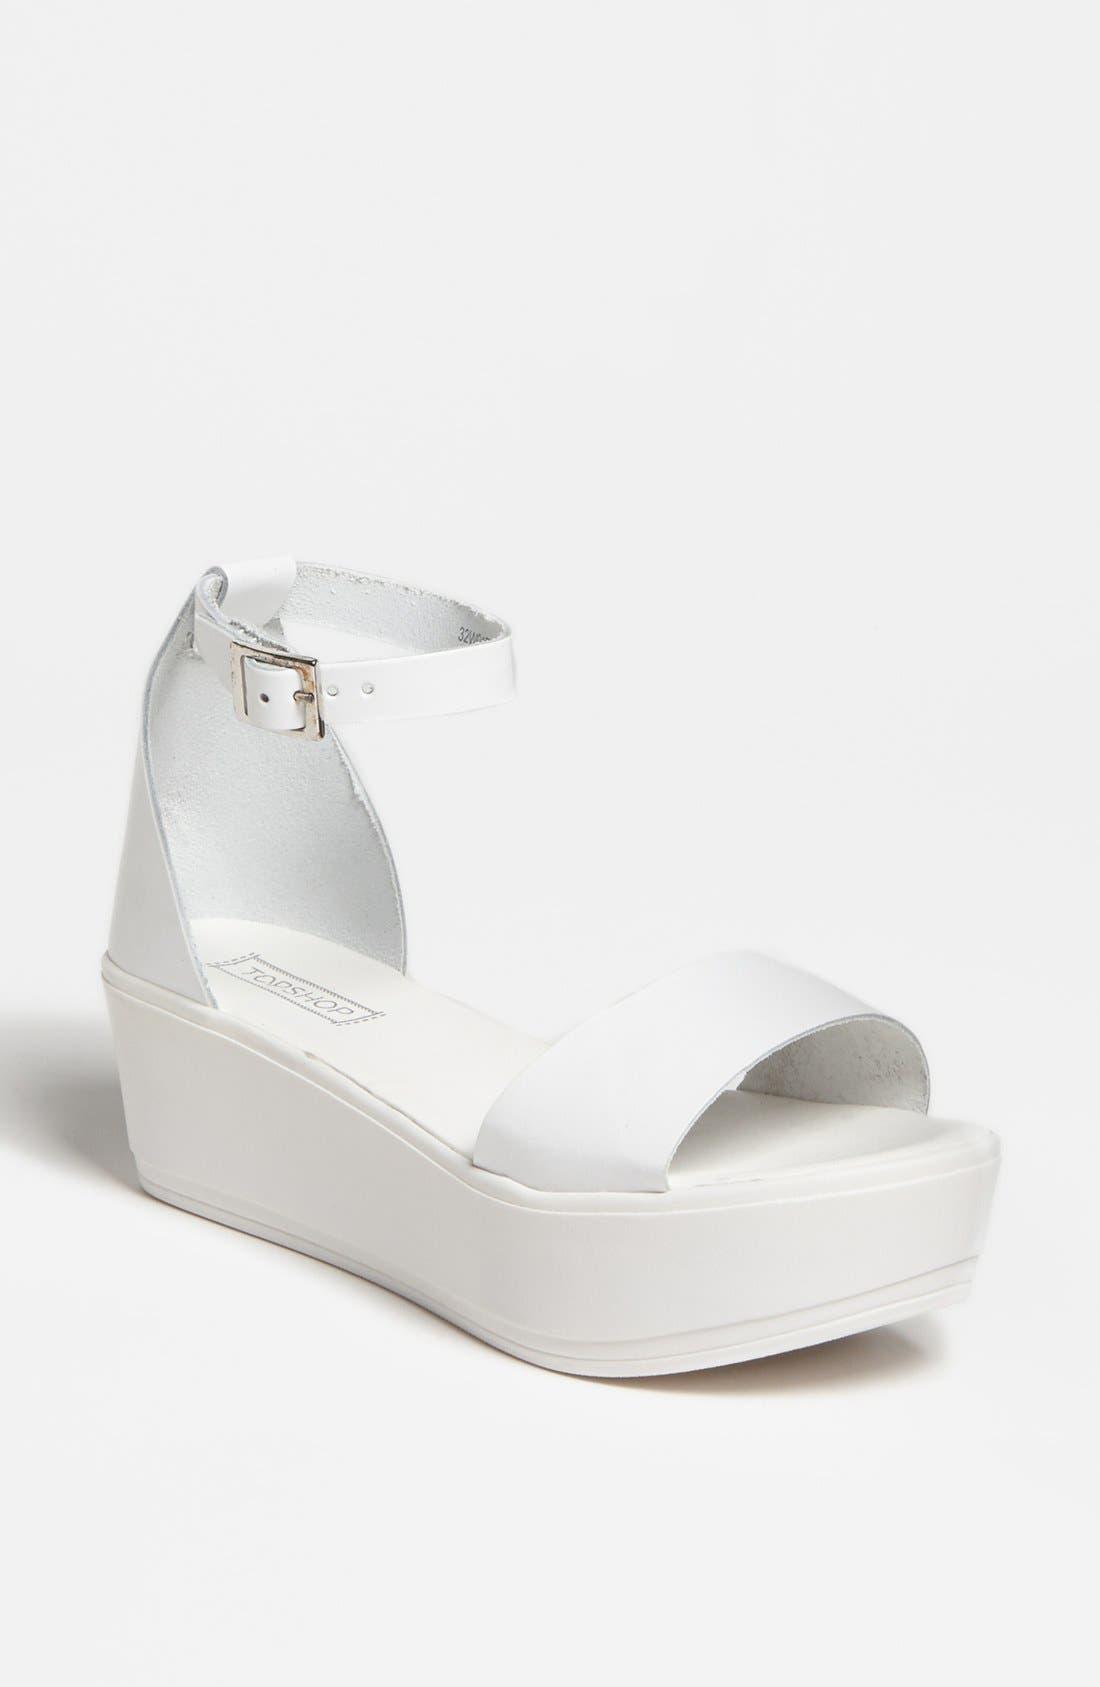 Alternate Image 1 Selected - Topshop 'Wills' Sandal